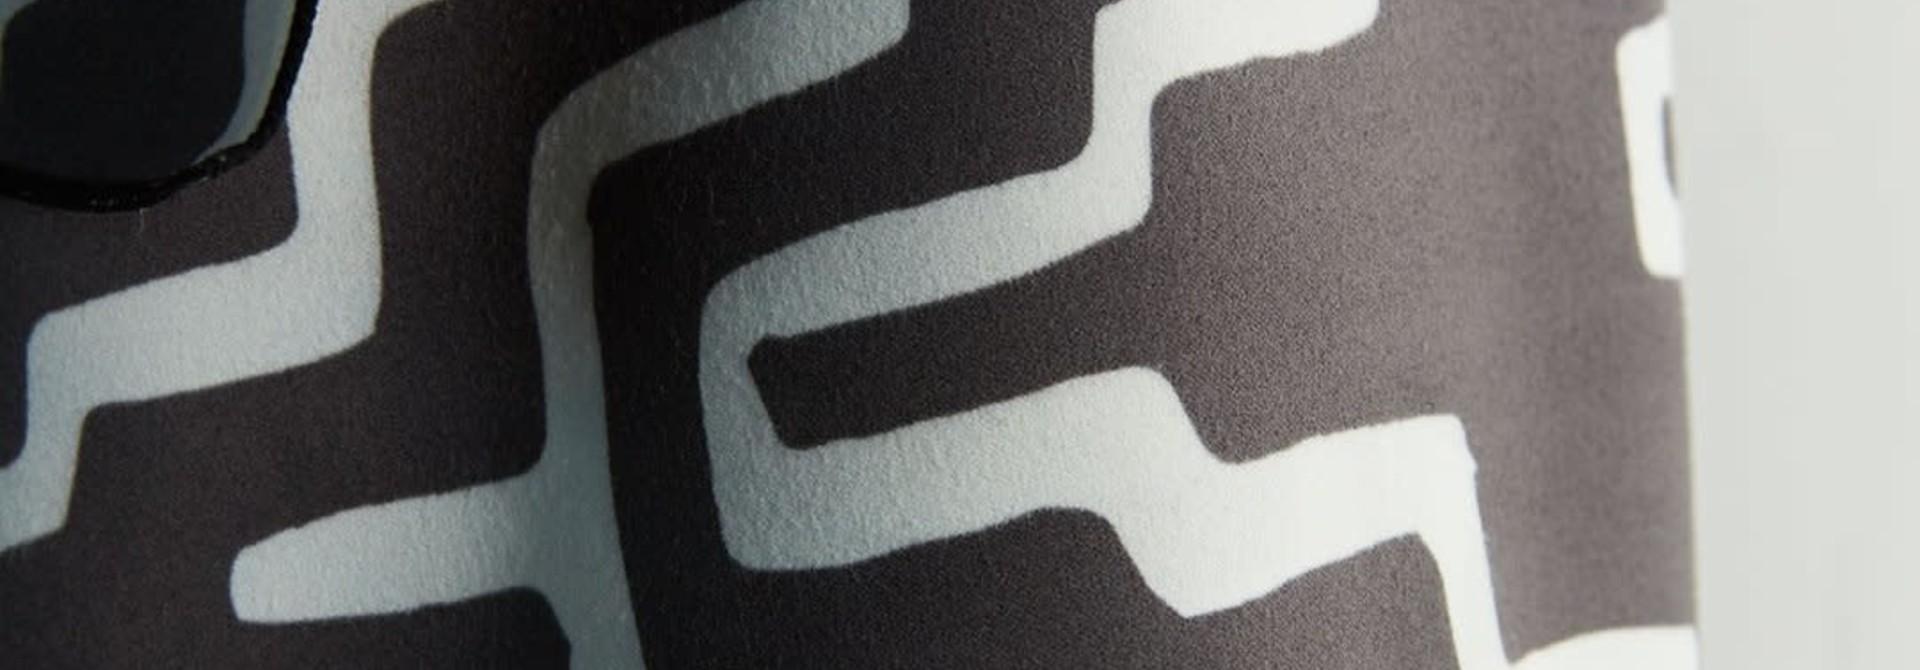 Nomadix Teton Black Ultralight Towel